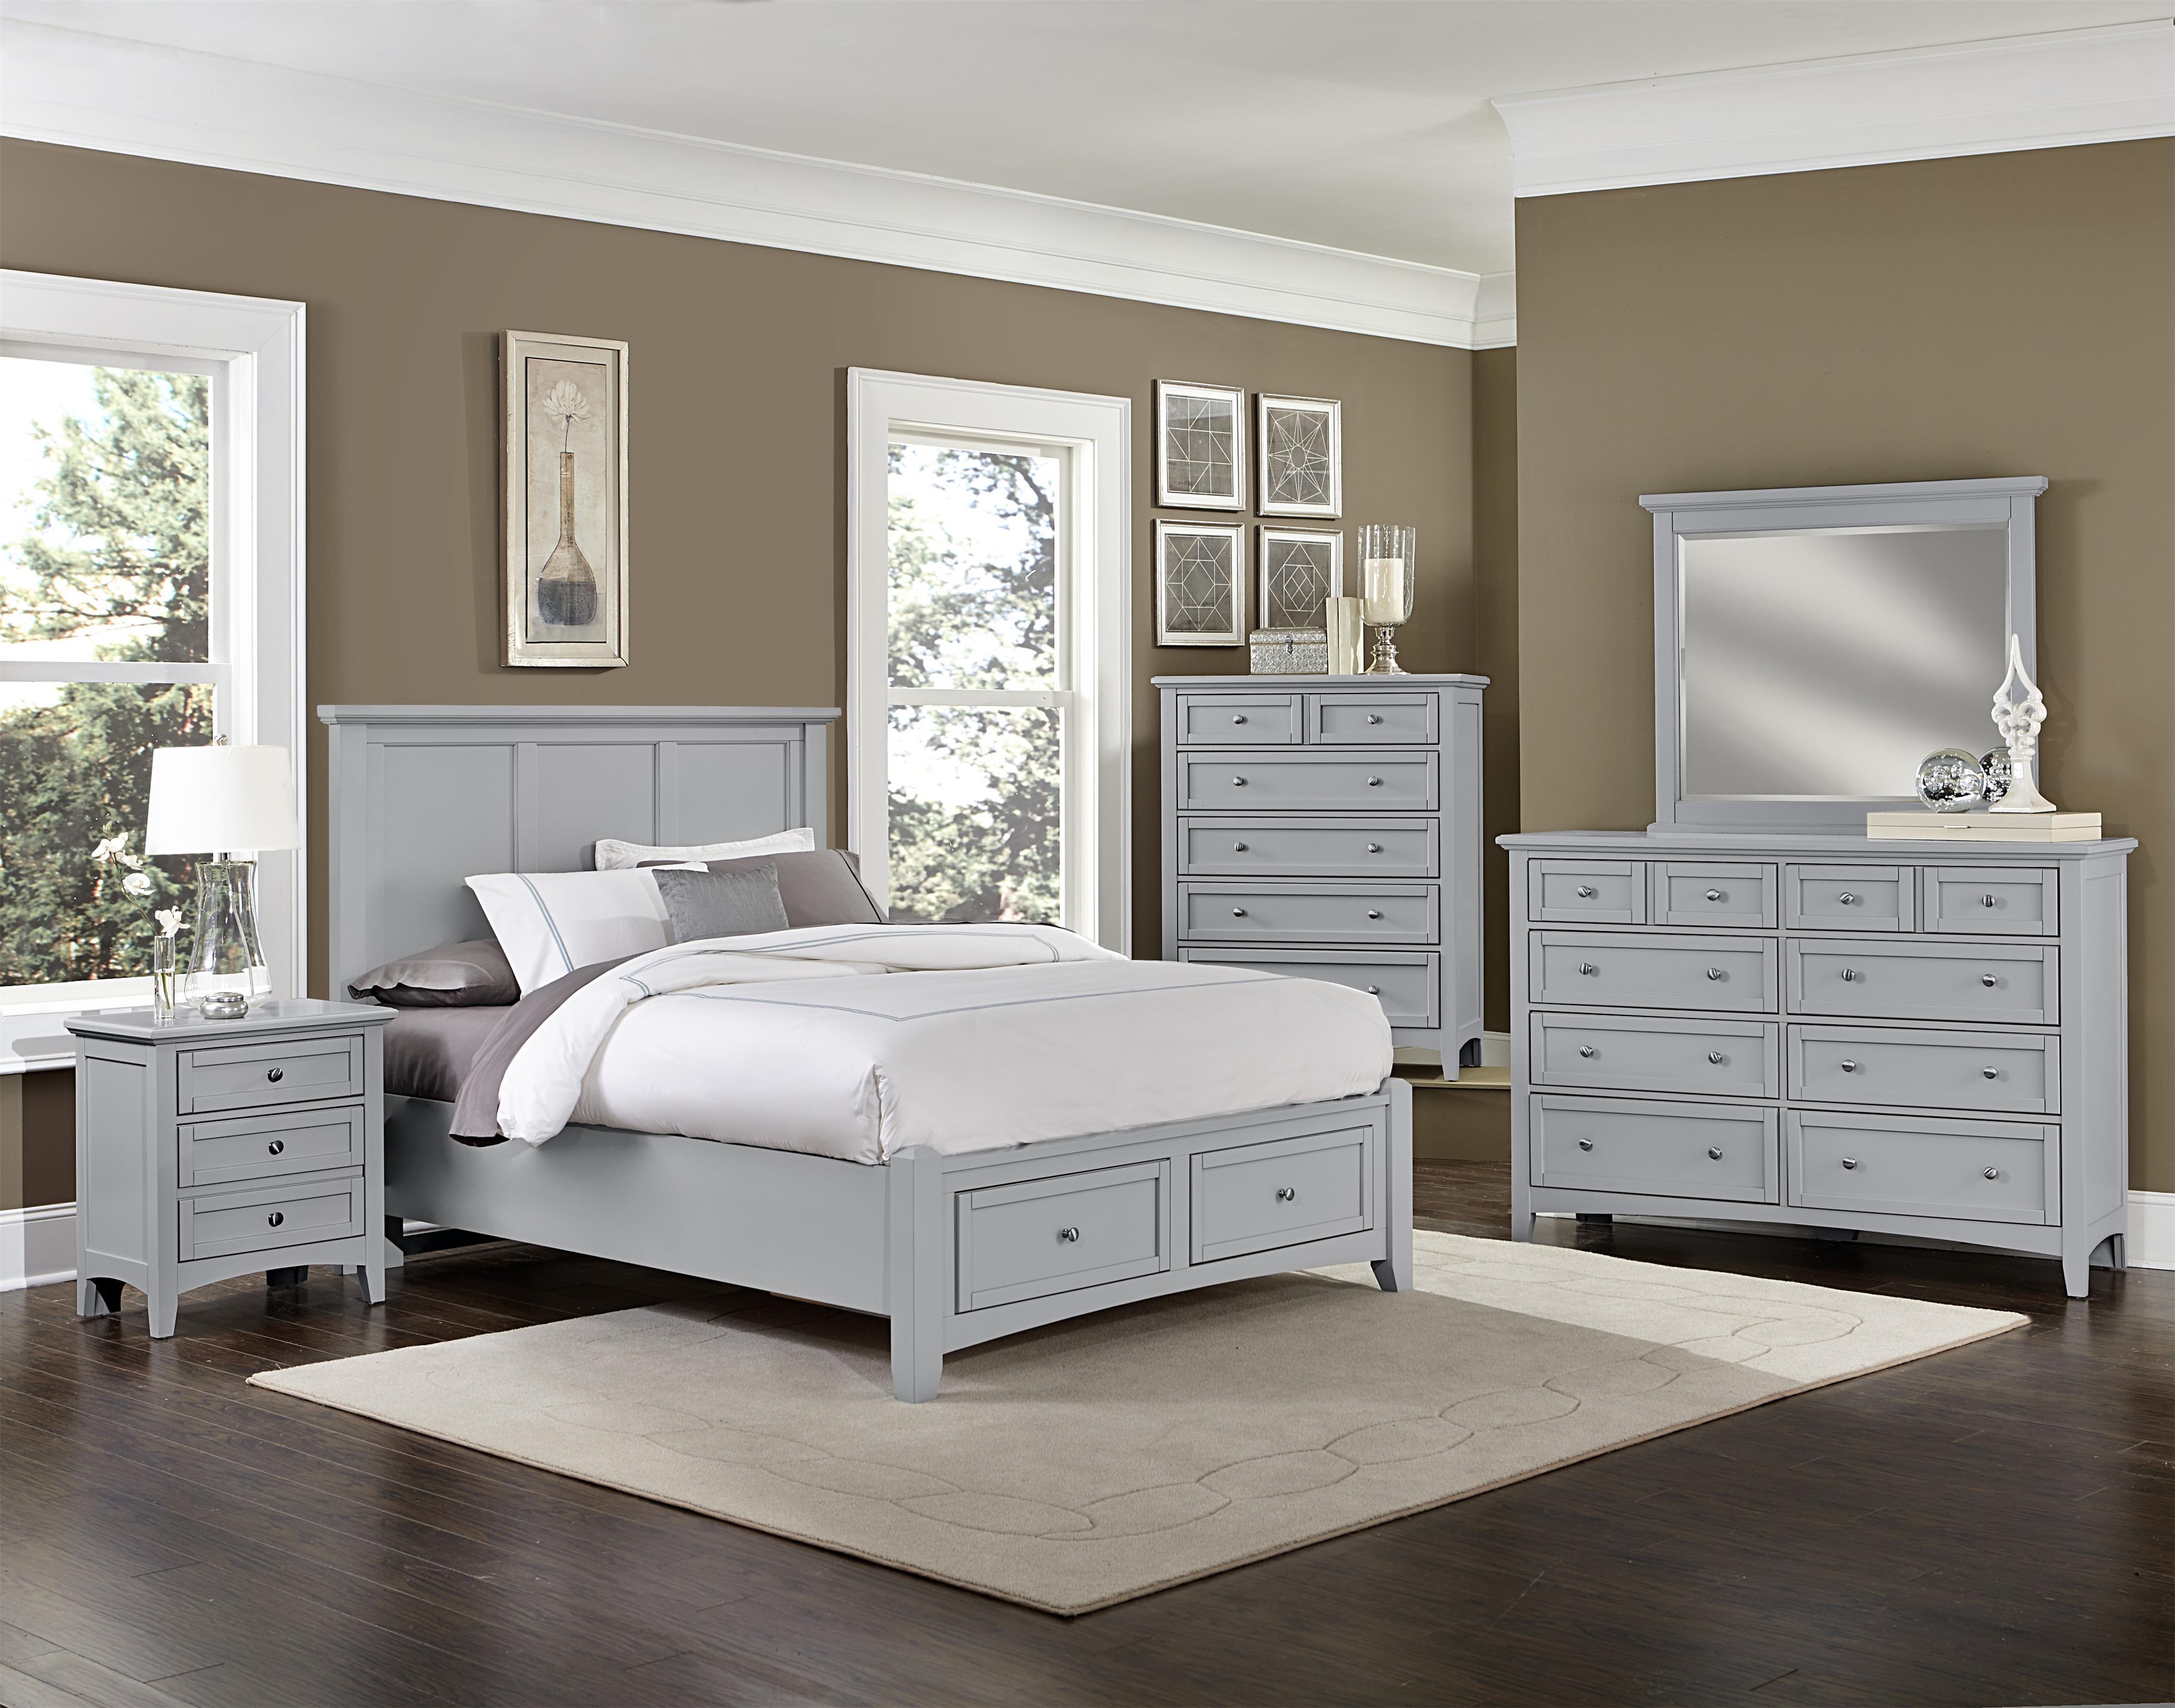 Vaughan Bassett Bonanza Twin Bedroom Group   Turk Furniture   Bedroom  Groups Joliet, La Salle, Kankakee, Plainfield, Bourbonnais, Ottawa,  Danville, Bradley, ...